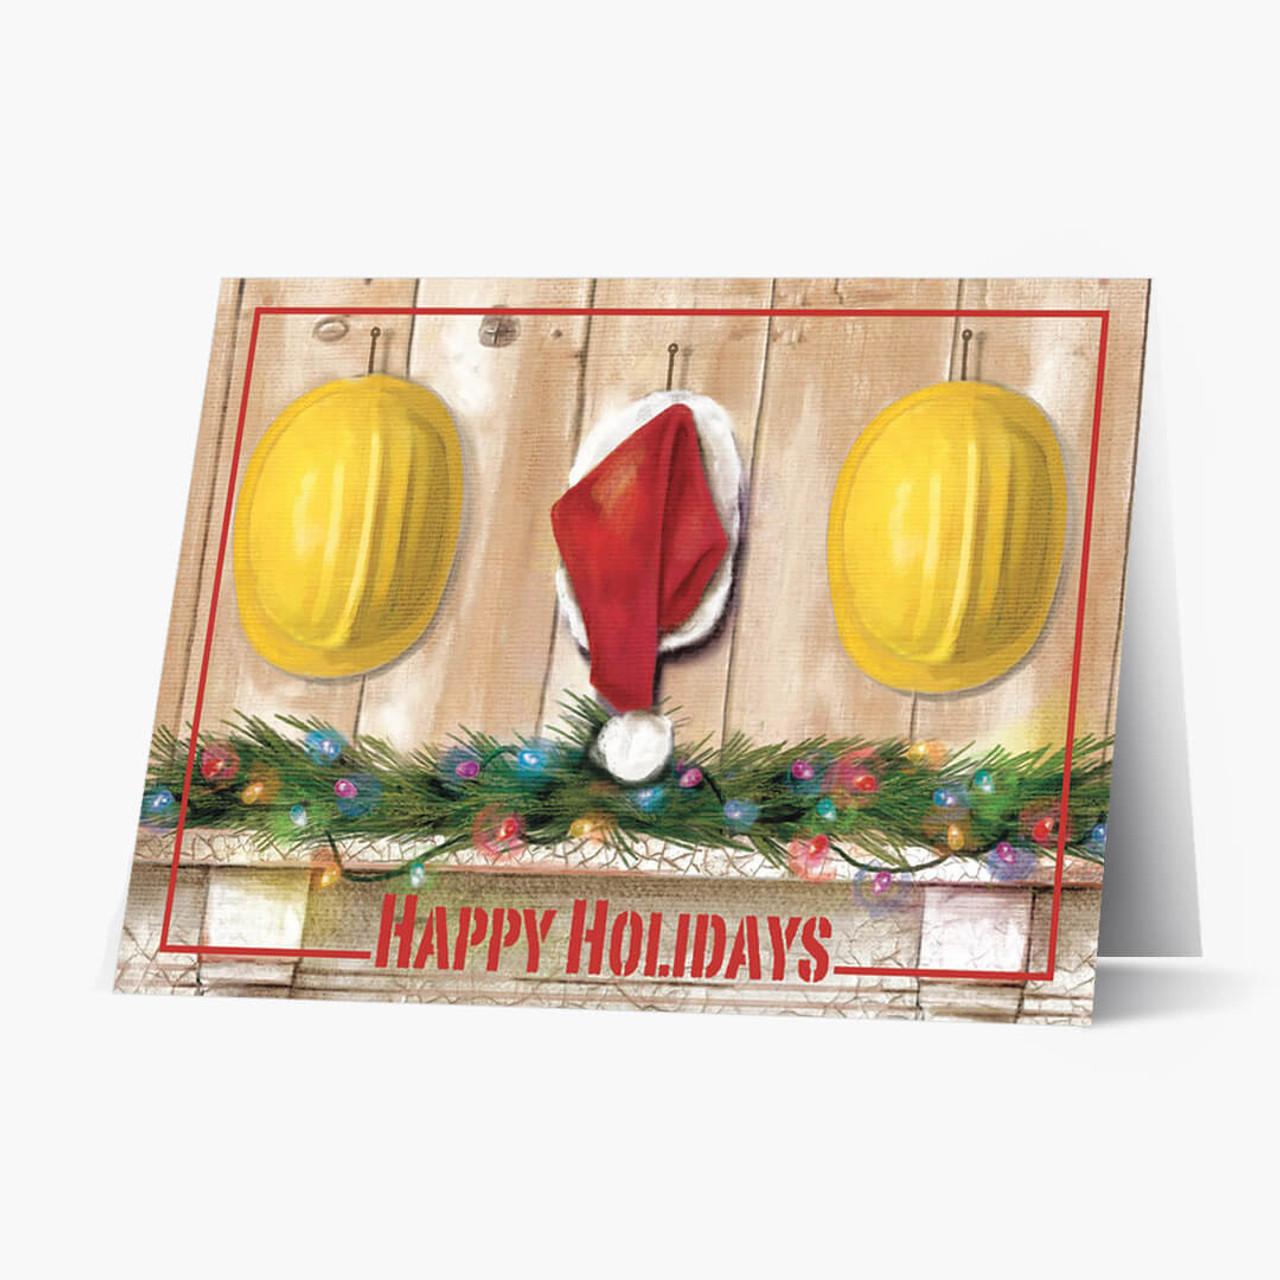 Construction Hats Christmas Card